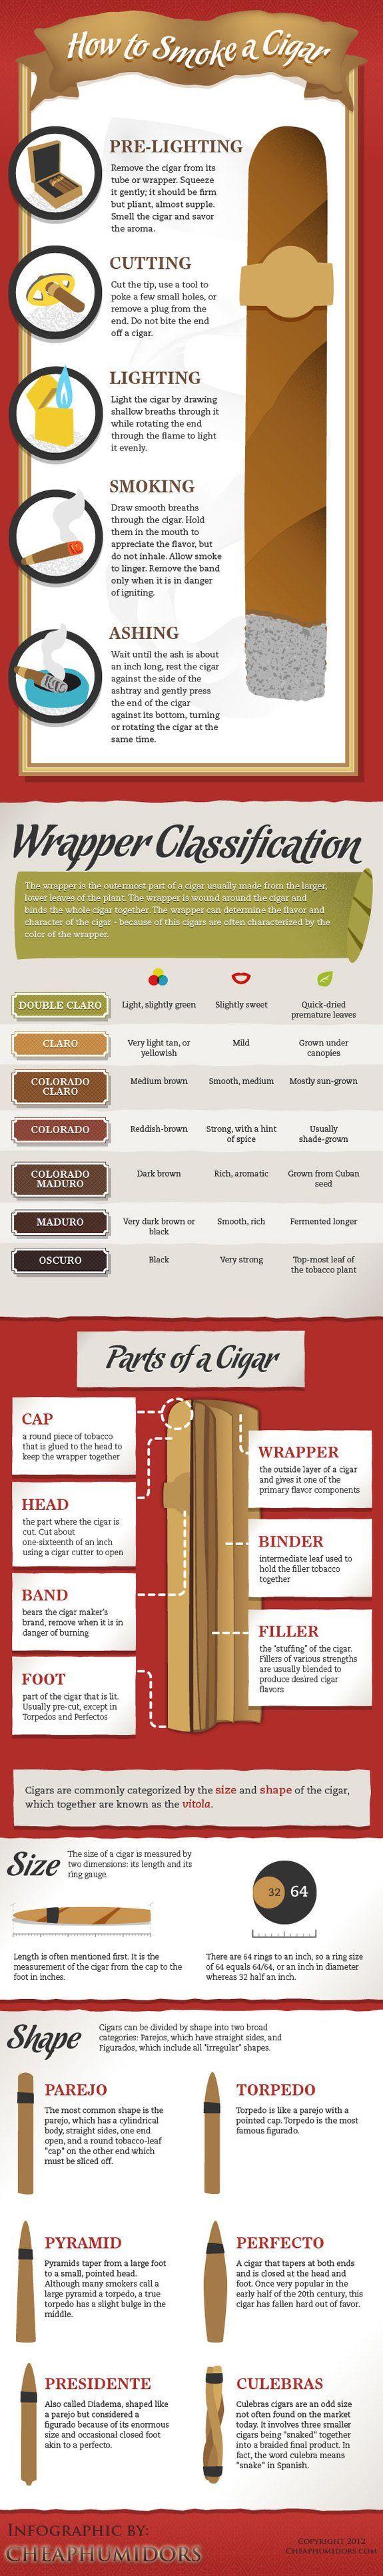 Cigar Smoking Infographic